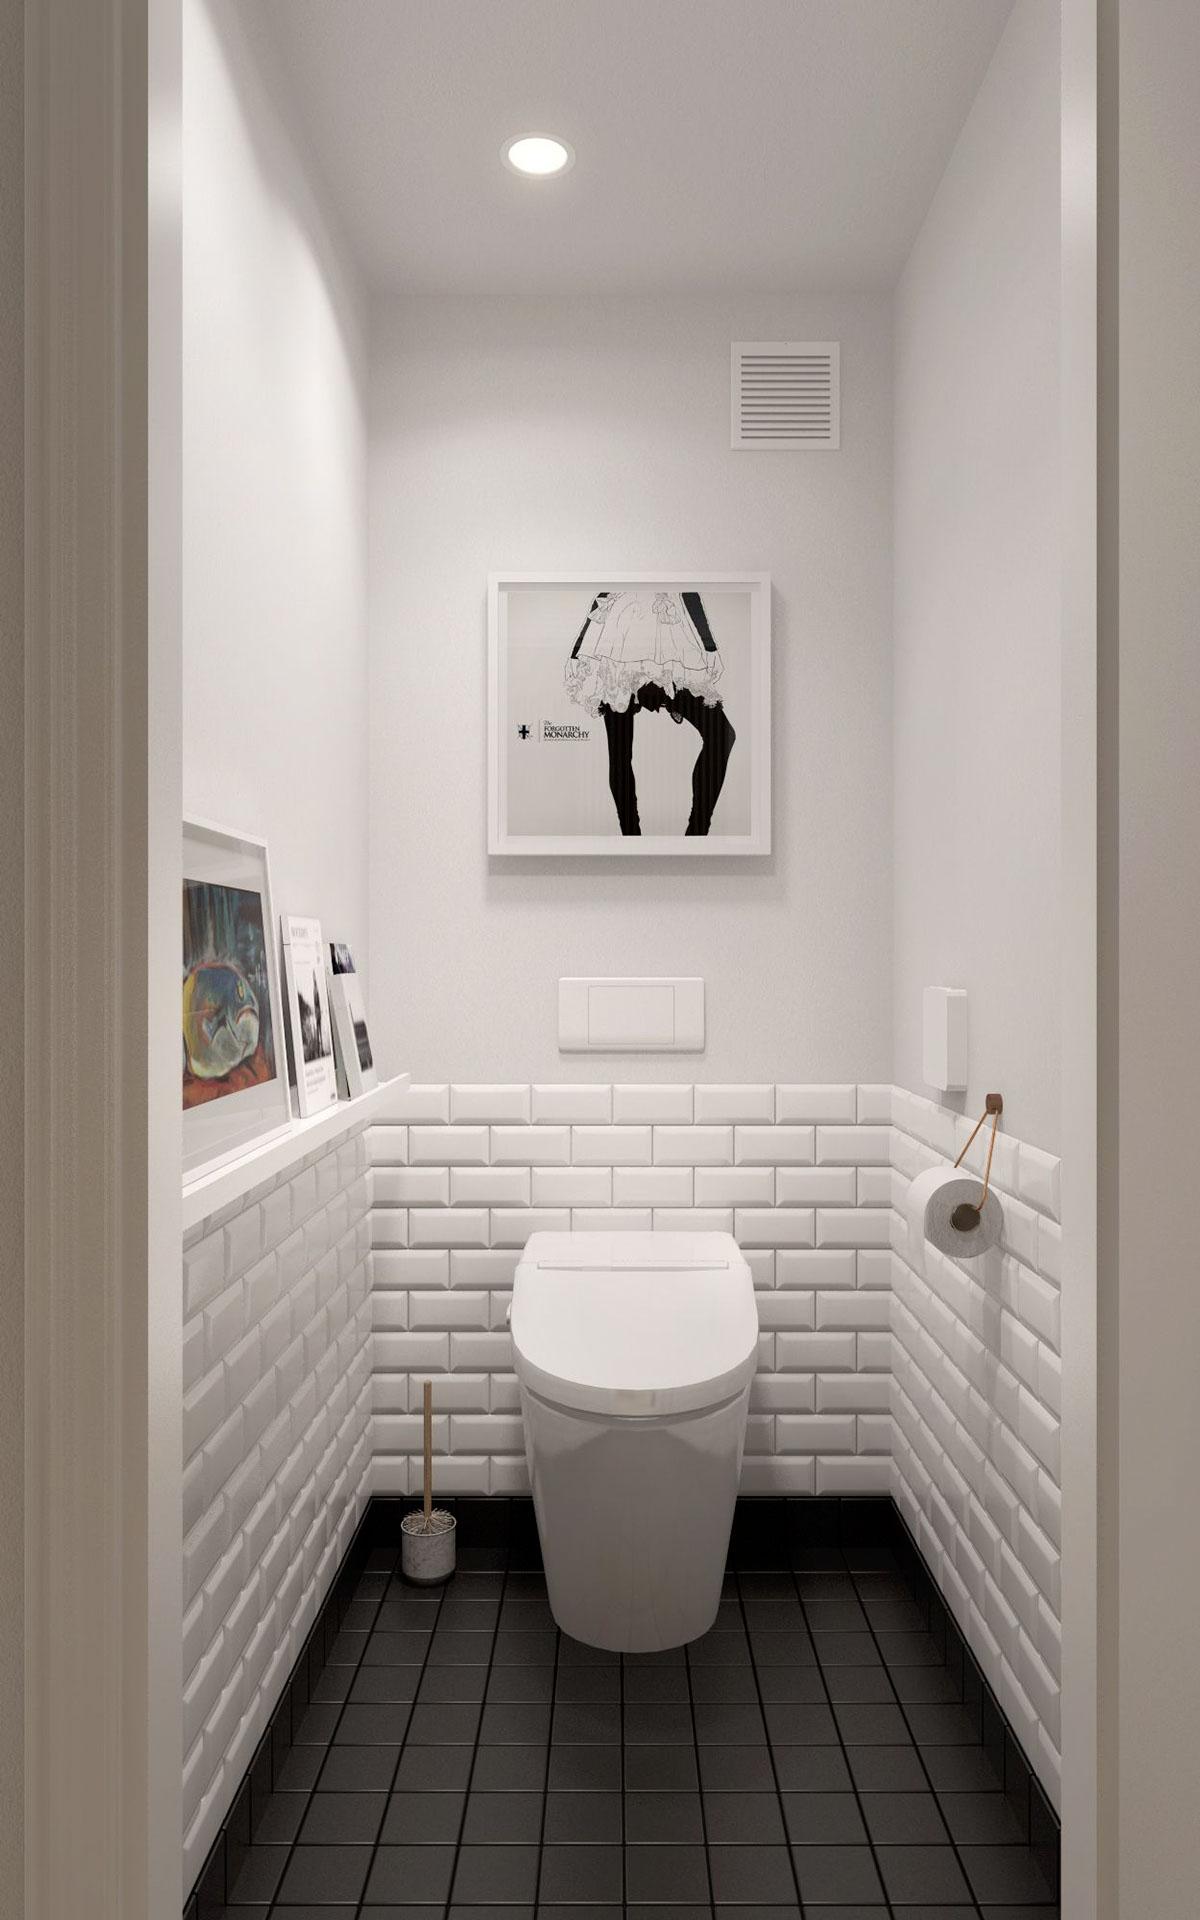 Scandinavian Bathroom Design Ideas With White Color Shade ... on White Bathroom Design Ideas  id=32818